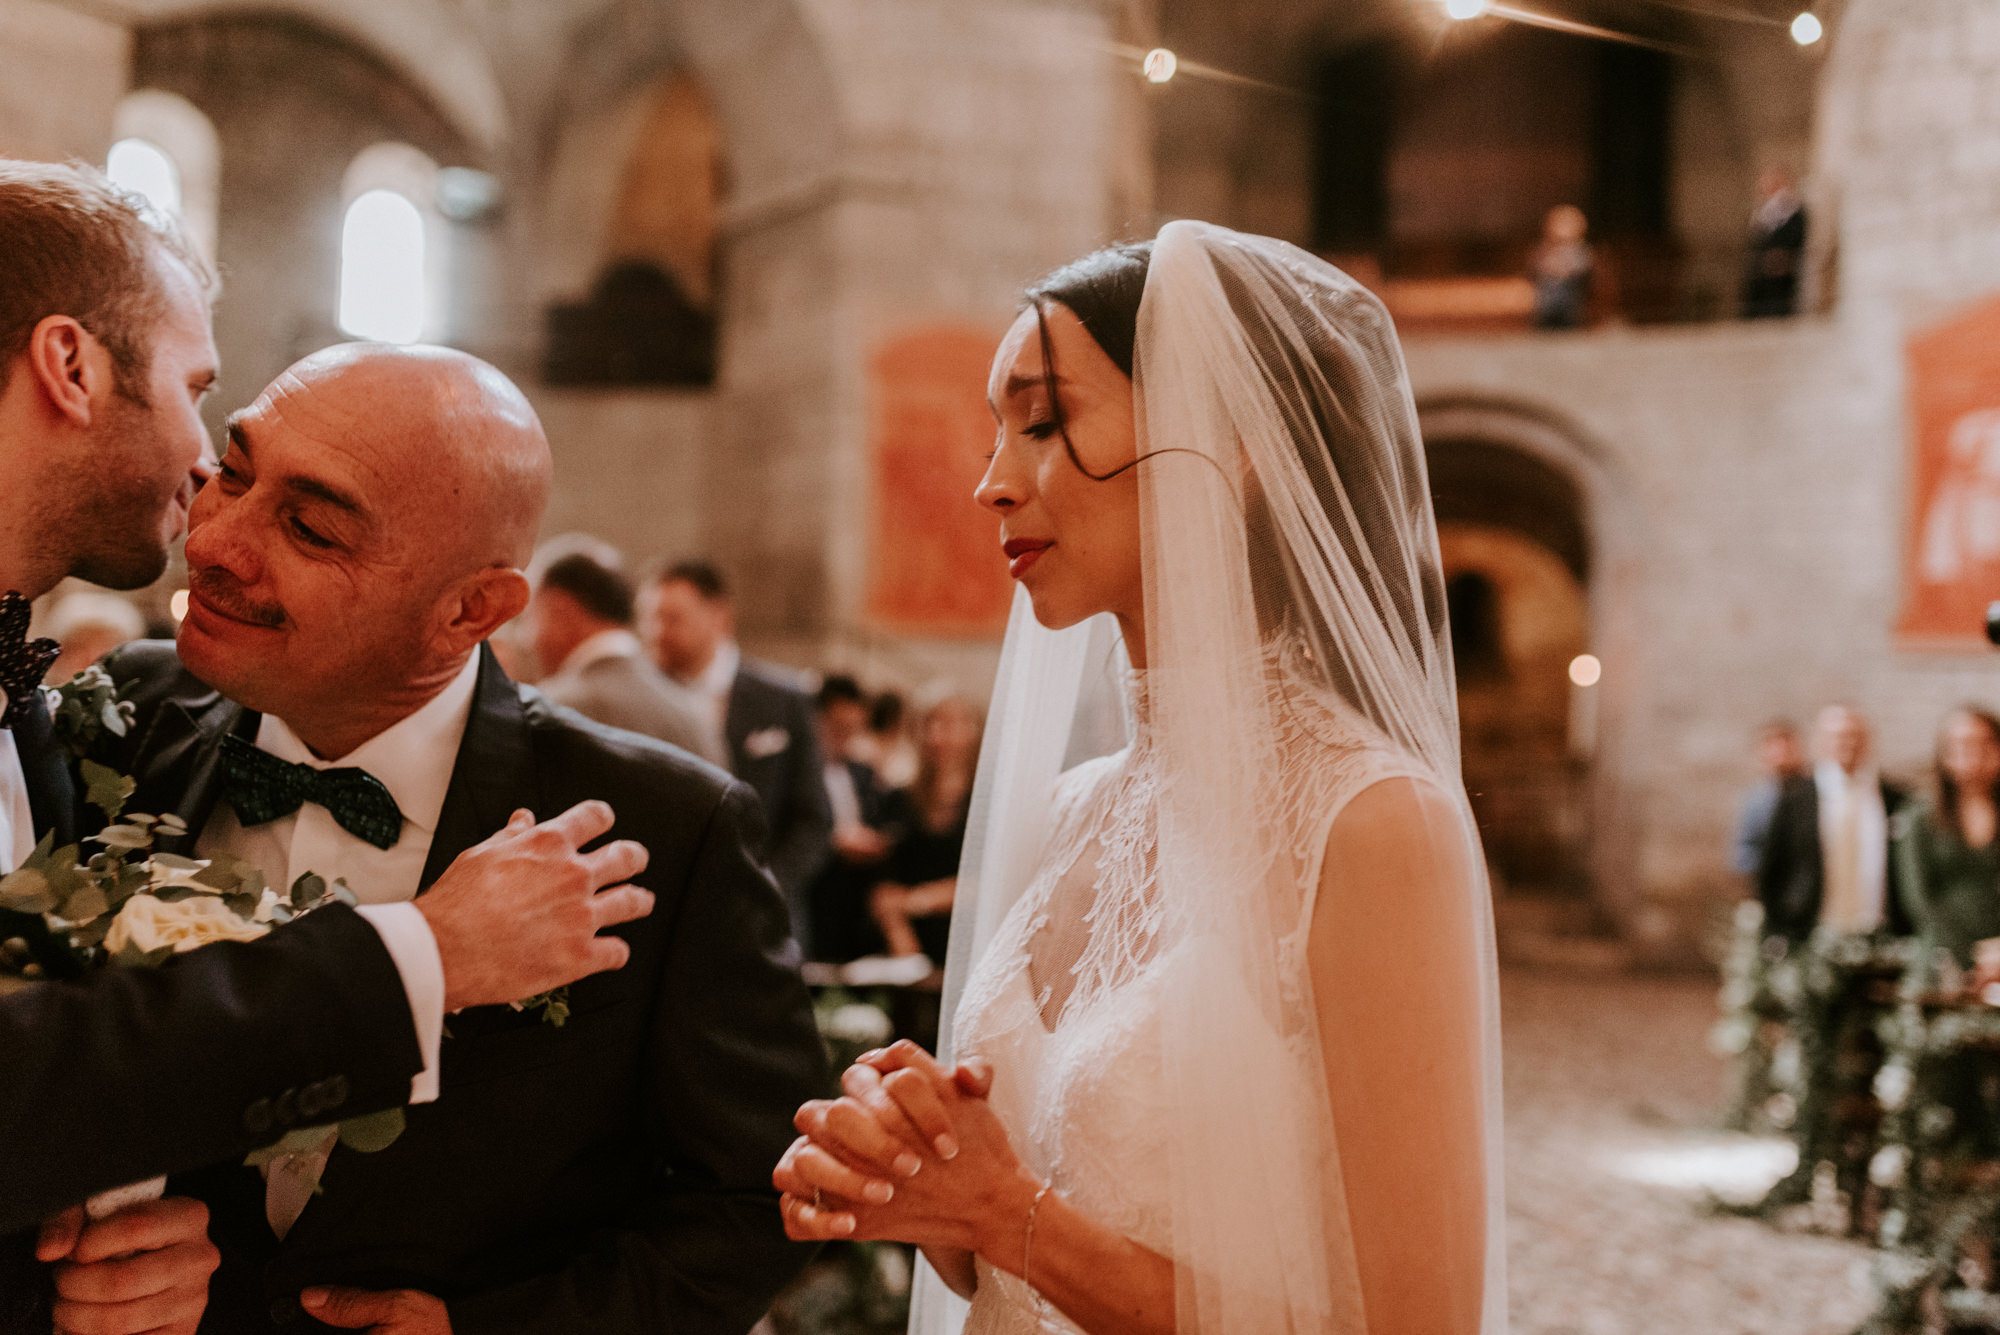 FOTO+PHOTO+BODA+WEDDING+ITALIA+ITALY+MAURICIO+GARAY+MAURICIOGARAY+WEDDINPHOTOGRAPHER+FOTOGRAFODEBODA-766.jpg